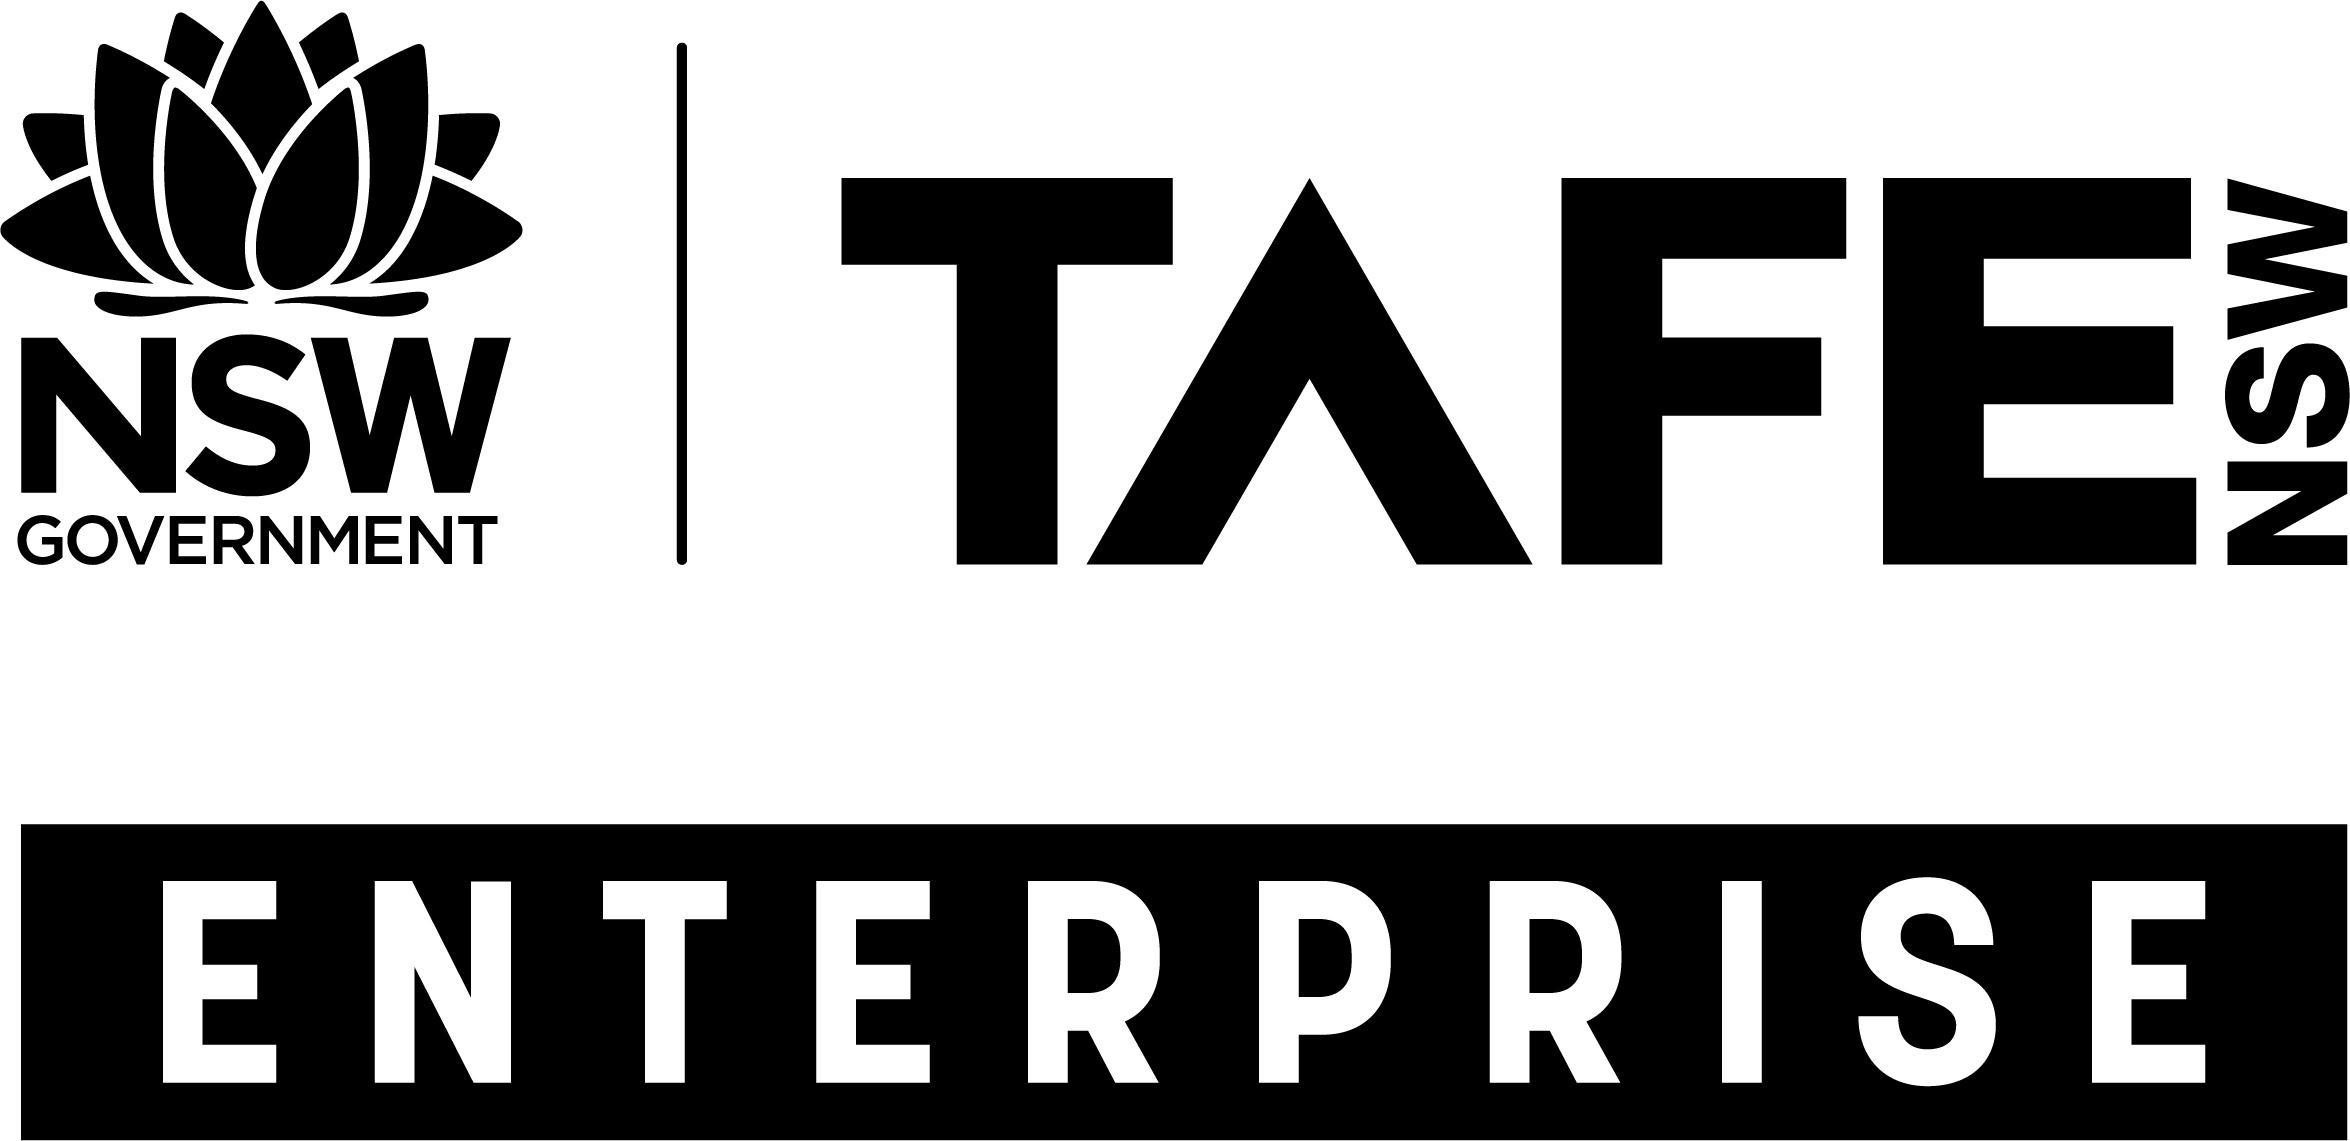 TAFENSW_ENTERPRISE_BLACK_STACKED_OCT_2018.jpg